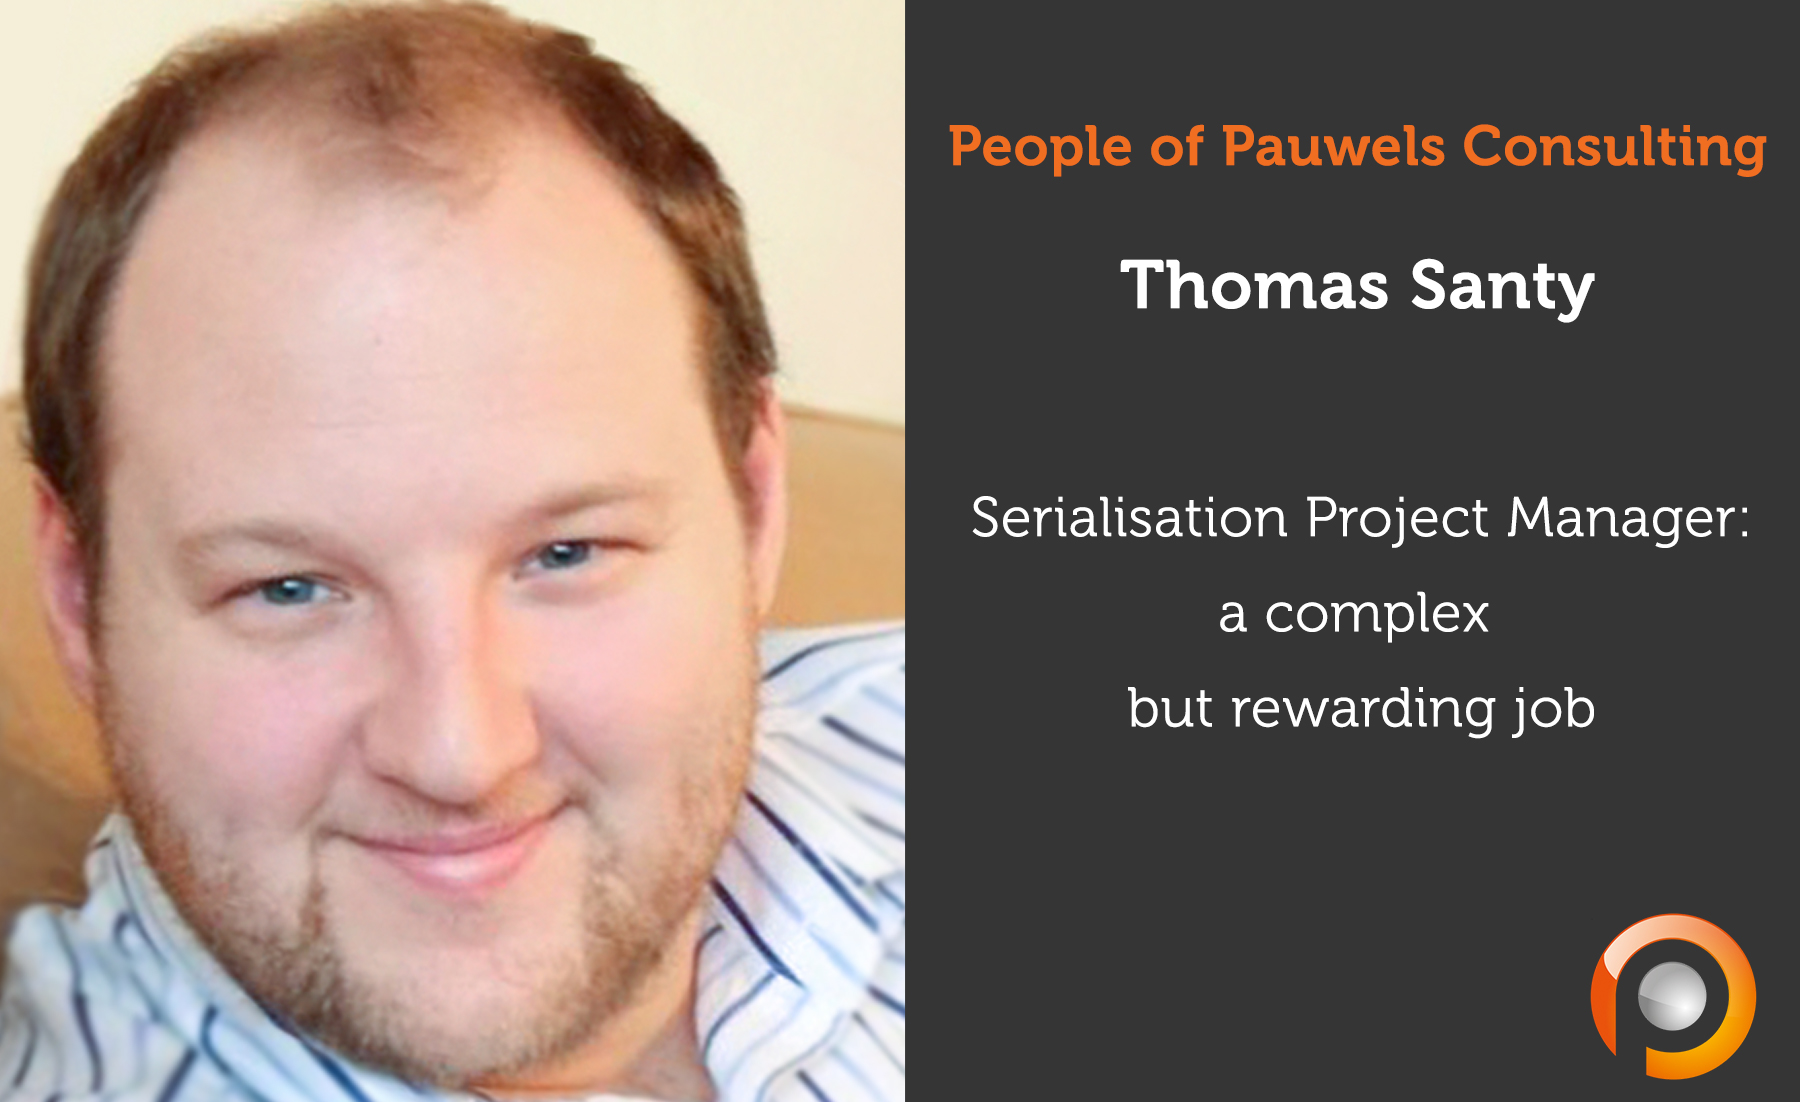 people-of-pauwels-consulting-thomas-santy-nl-li